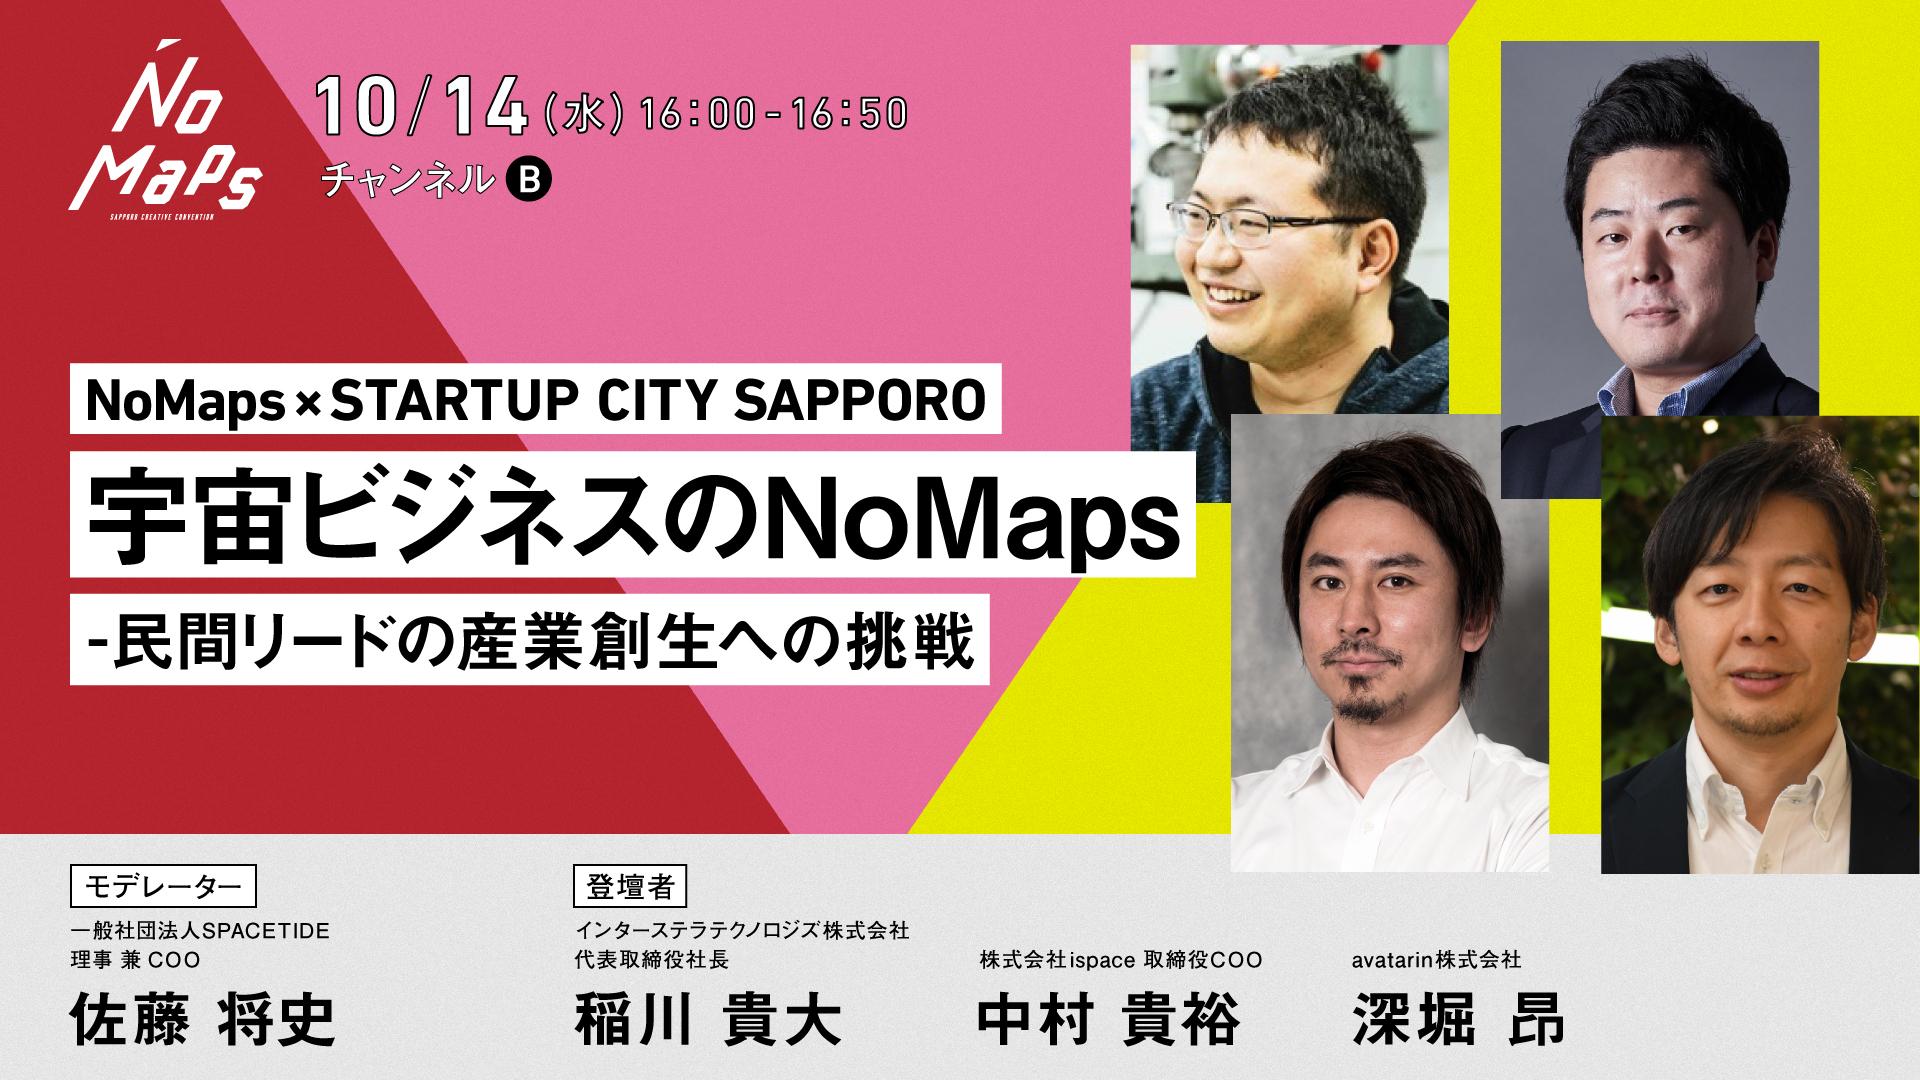 【NoMapsレポート】宇宙ビジネスのNoMaps – 民間リードの産業創生への挑戦